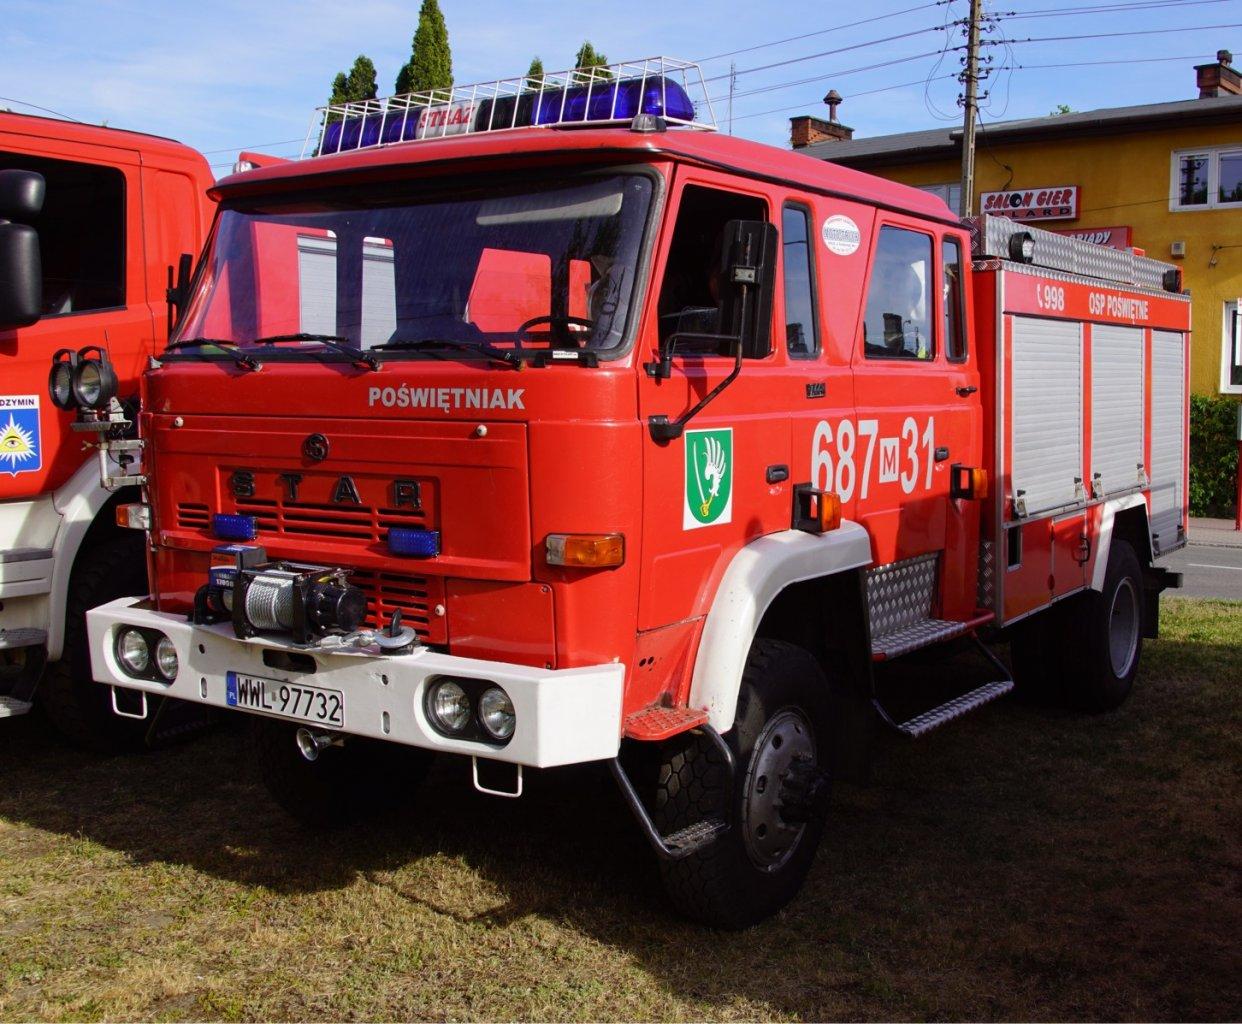 DSC03566.JPG